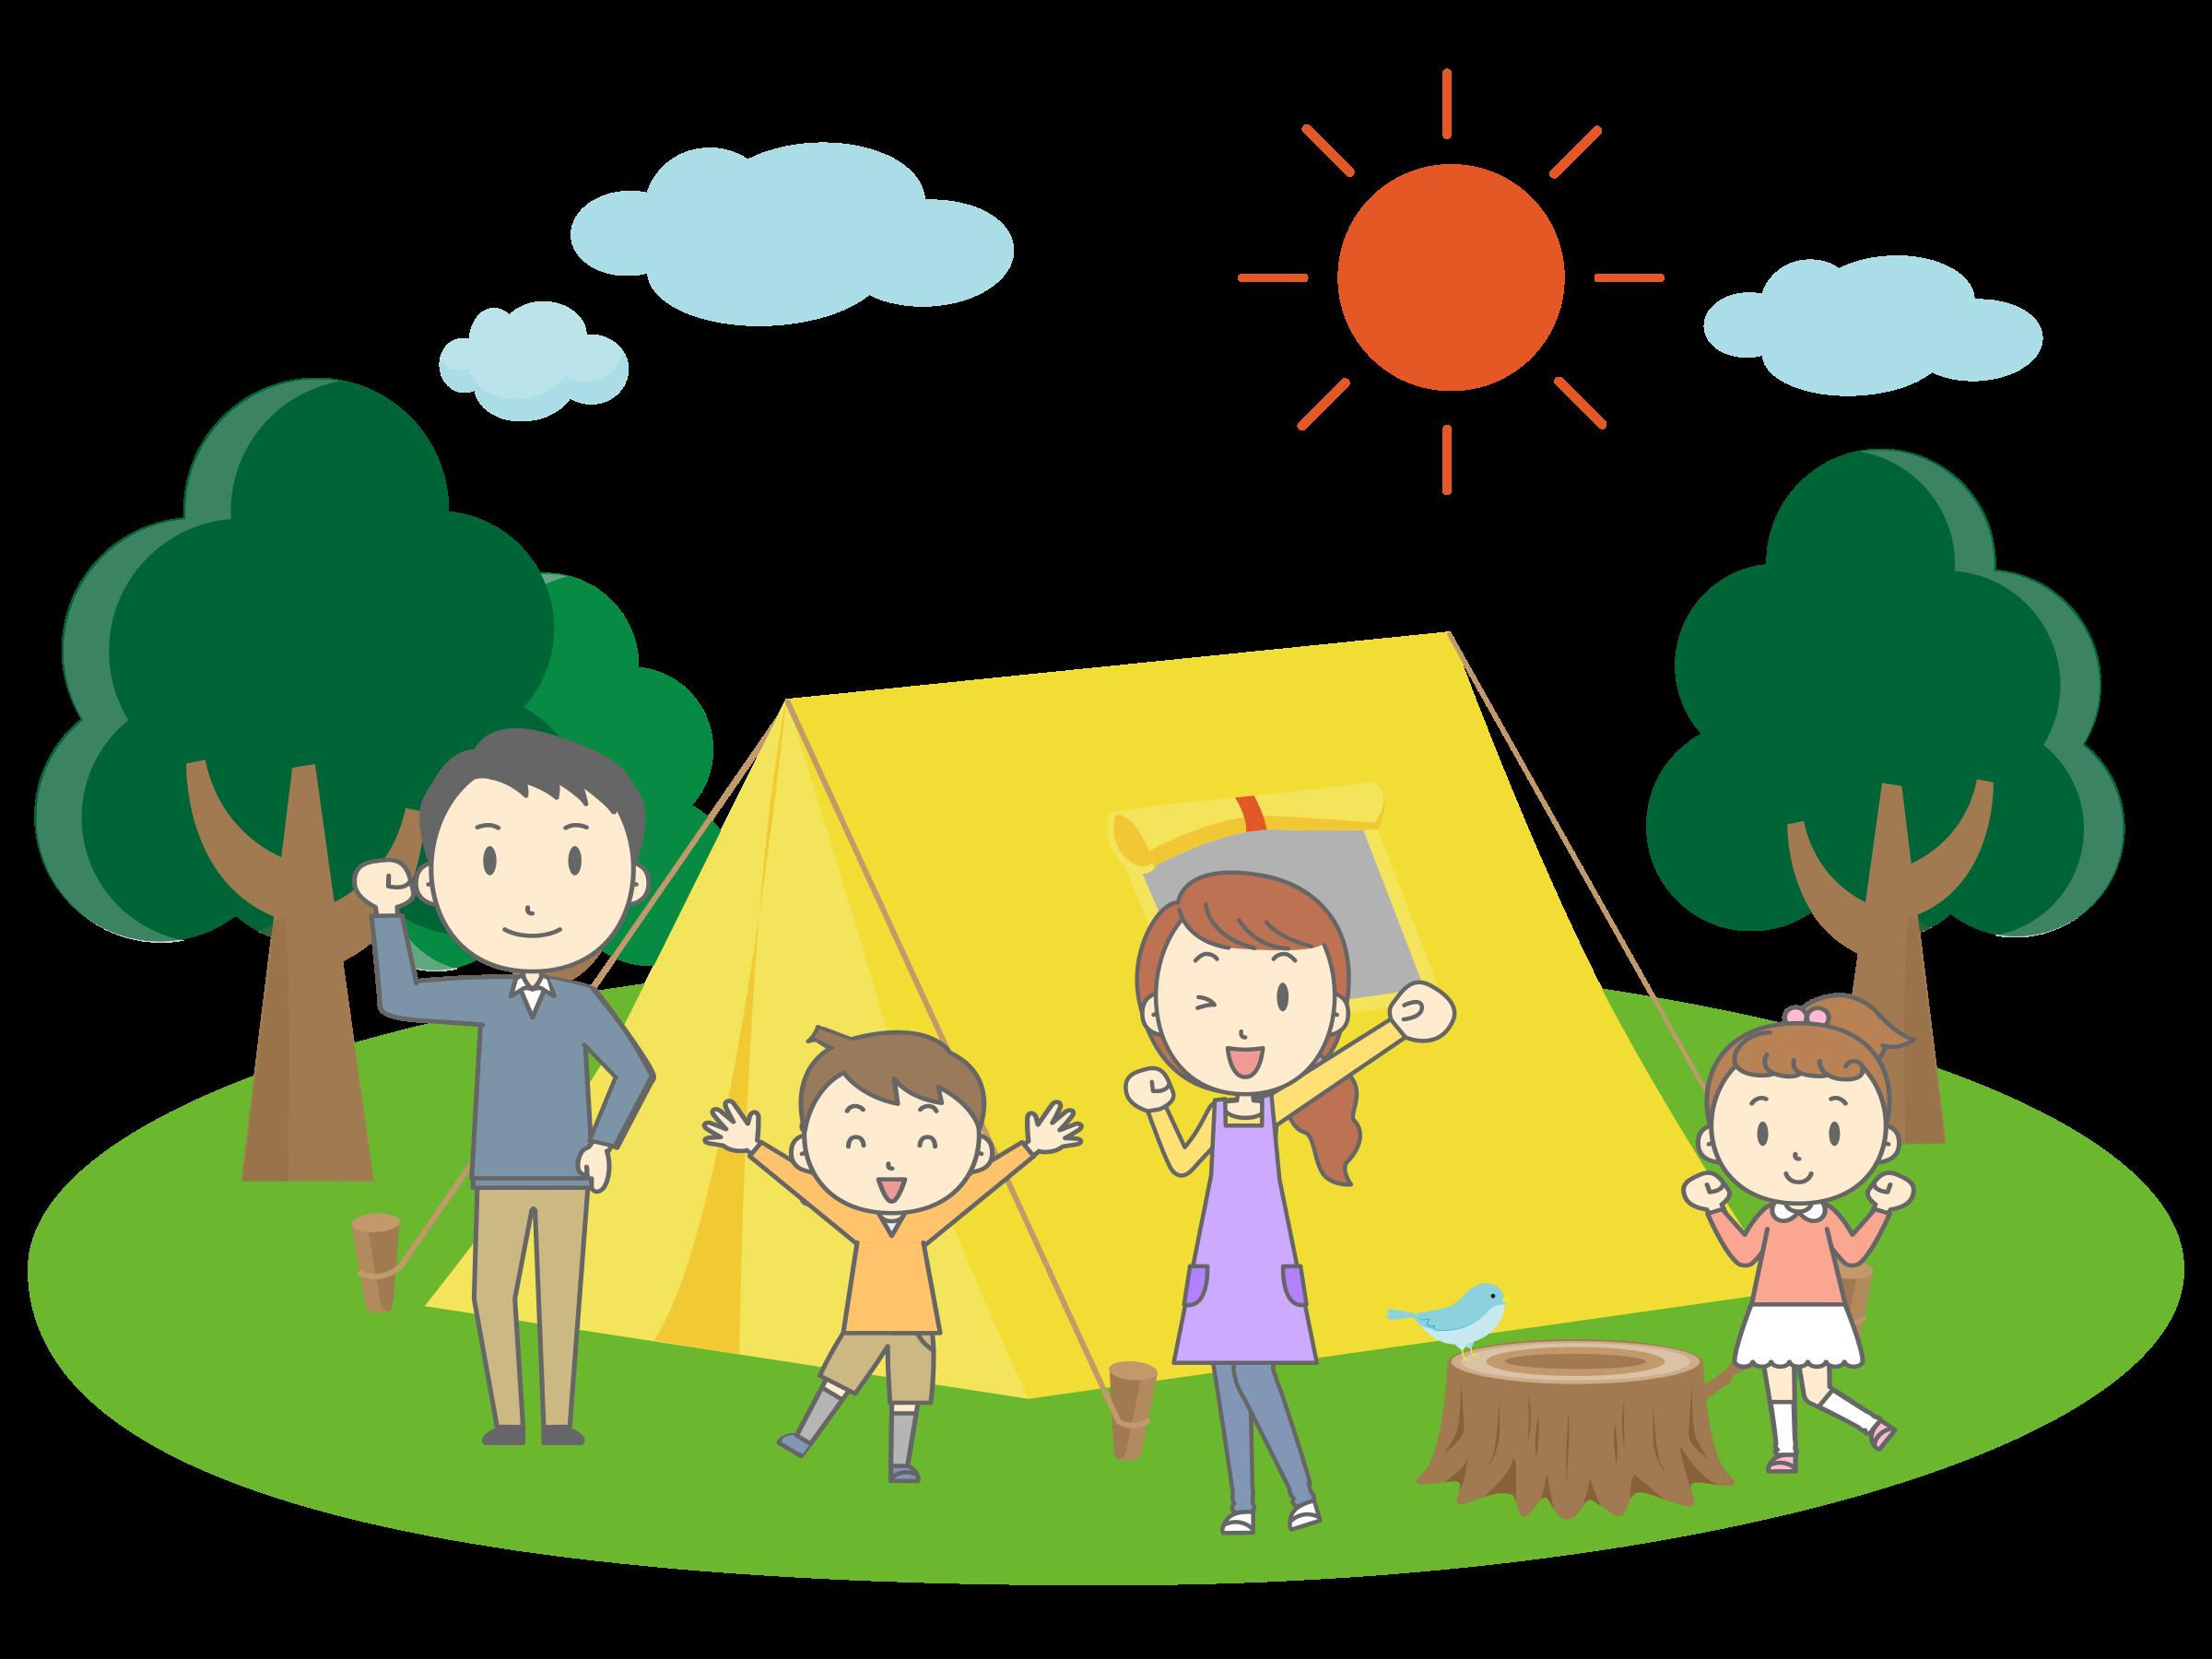 vector free download Cartoon clipart camping. Family big image png.